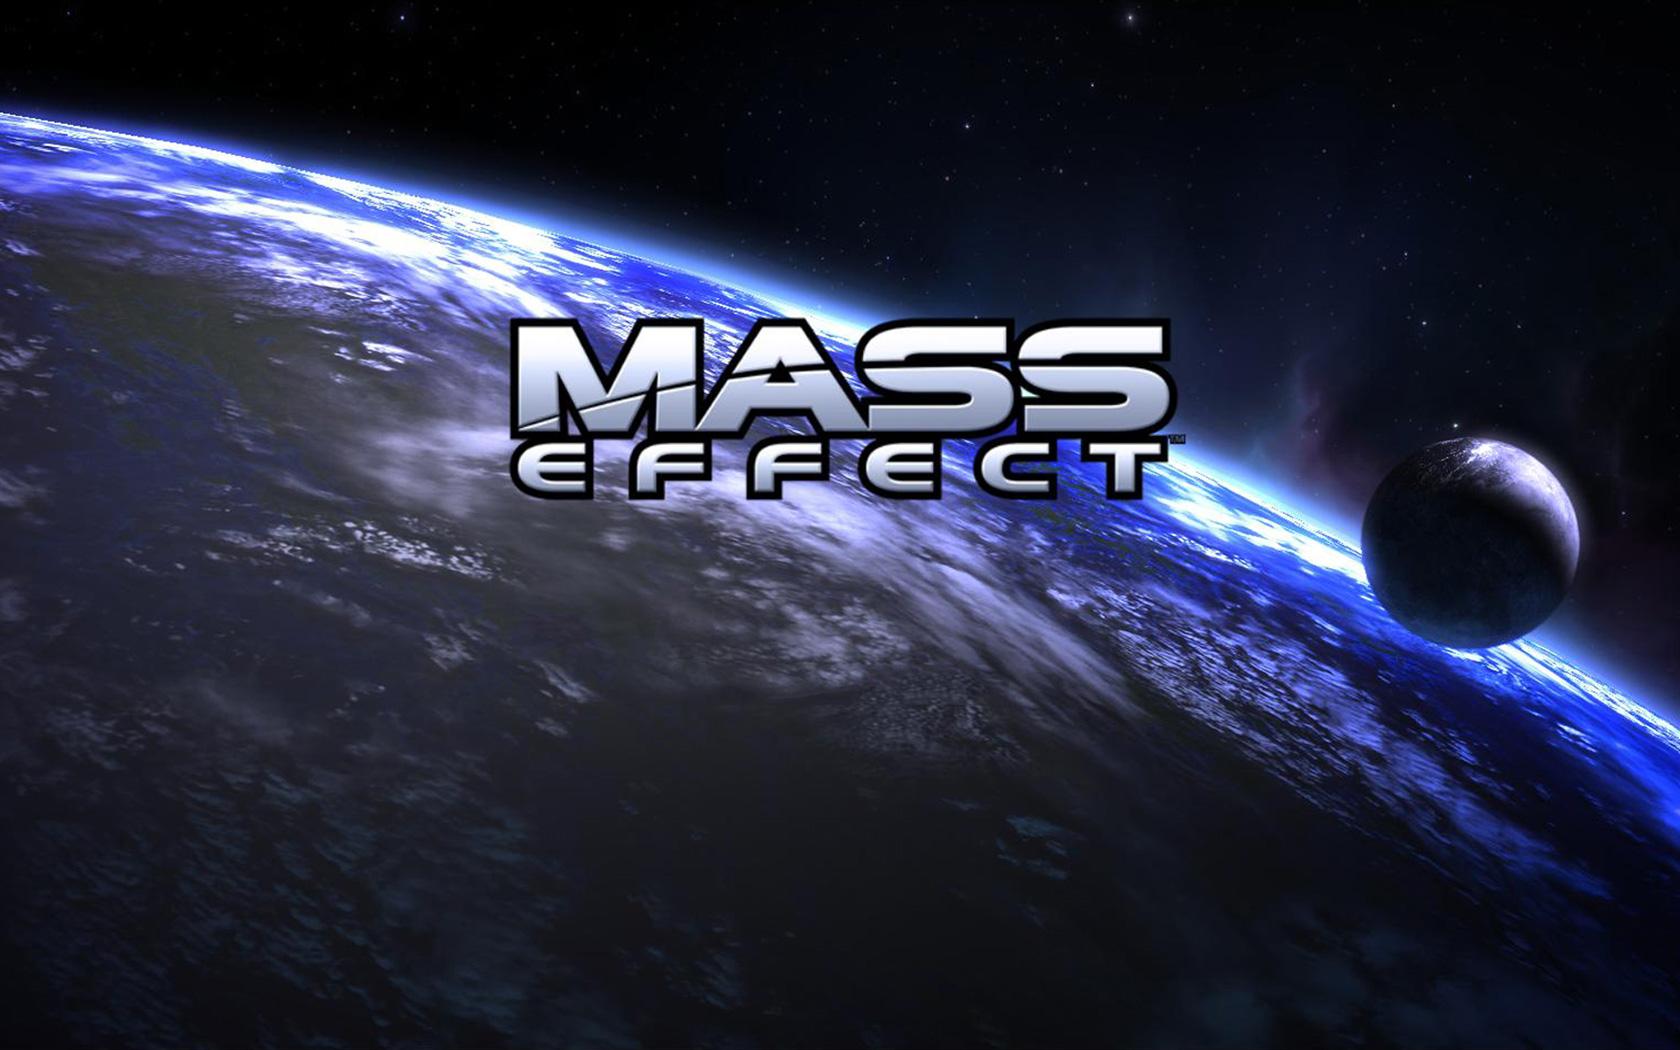 Free Mass Effect Wallpaper in 1680x1050